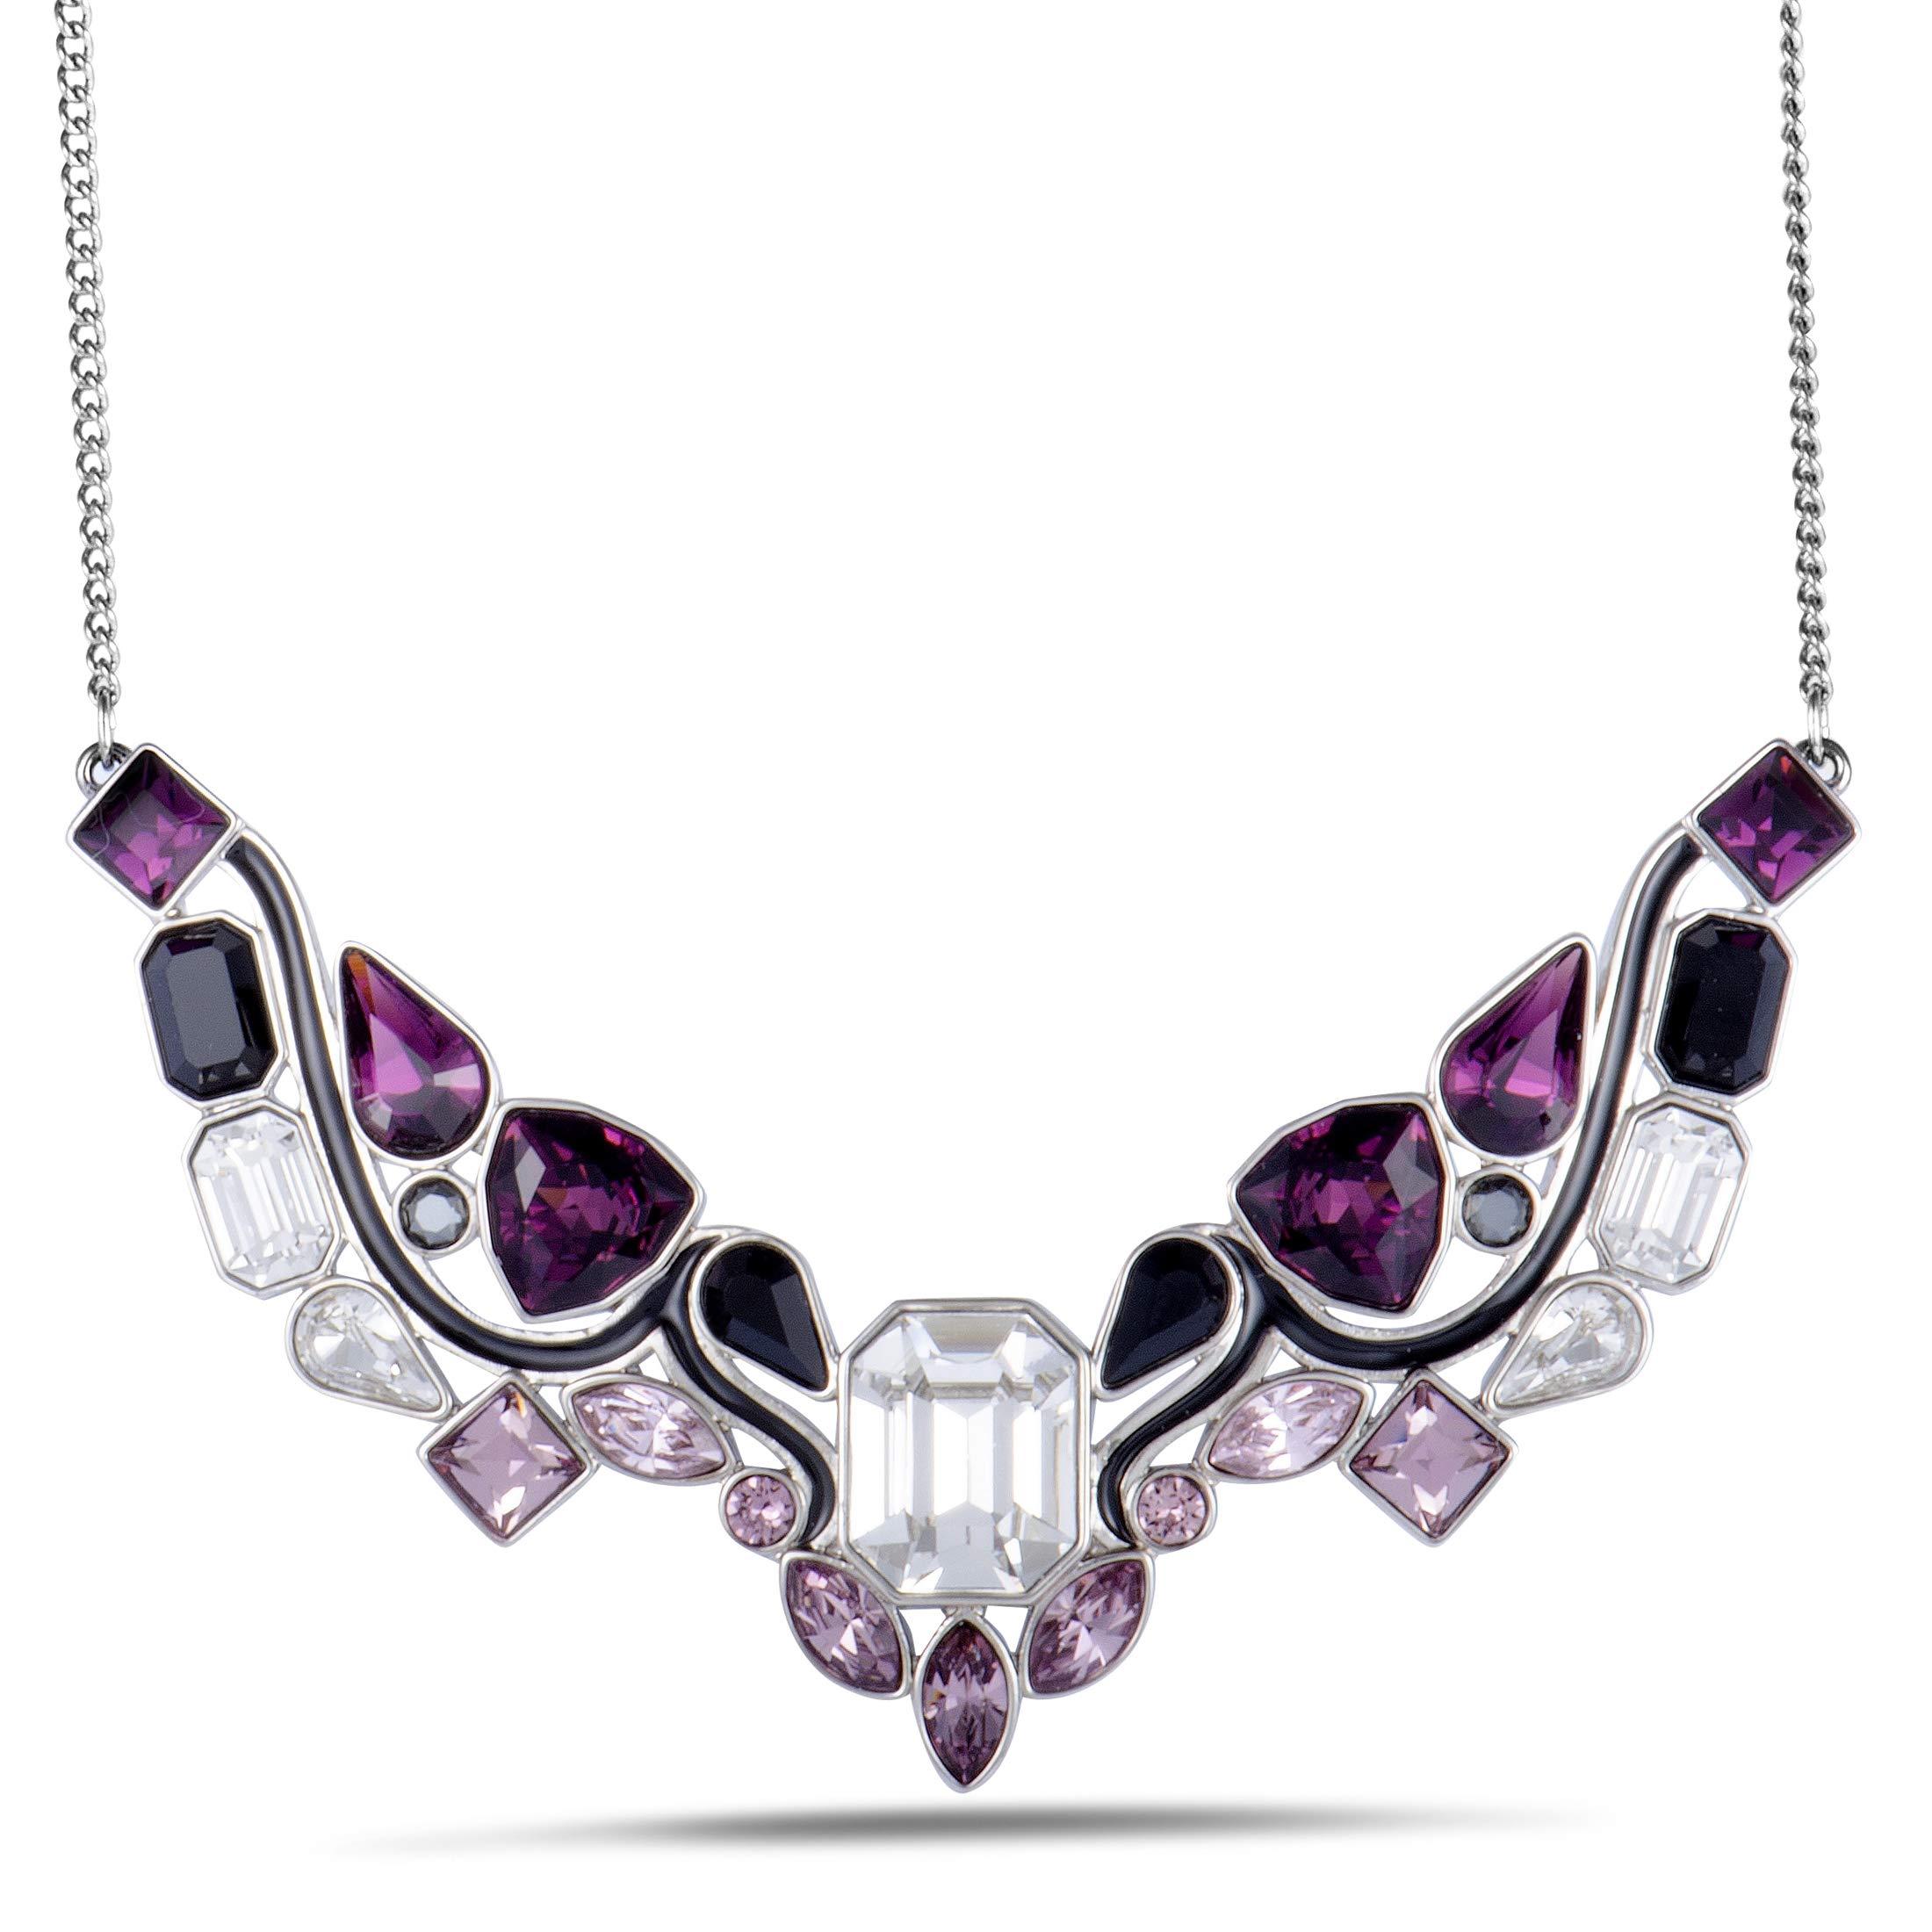 Swarovski Impulse 5152835 Multi Color Crystal Rhodium Plated Bib Necklace by SWAROVSKI